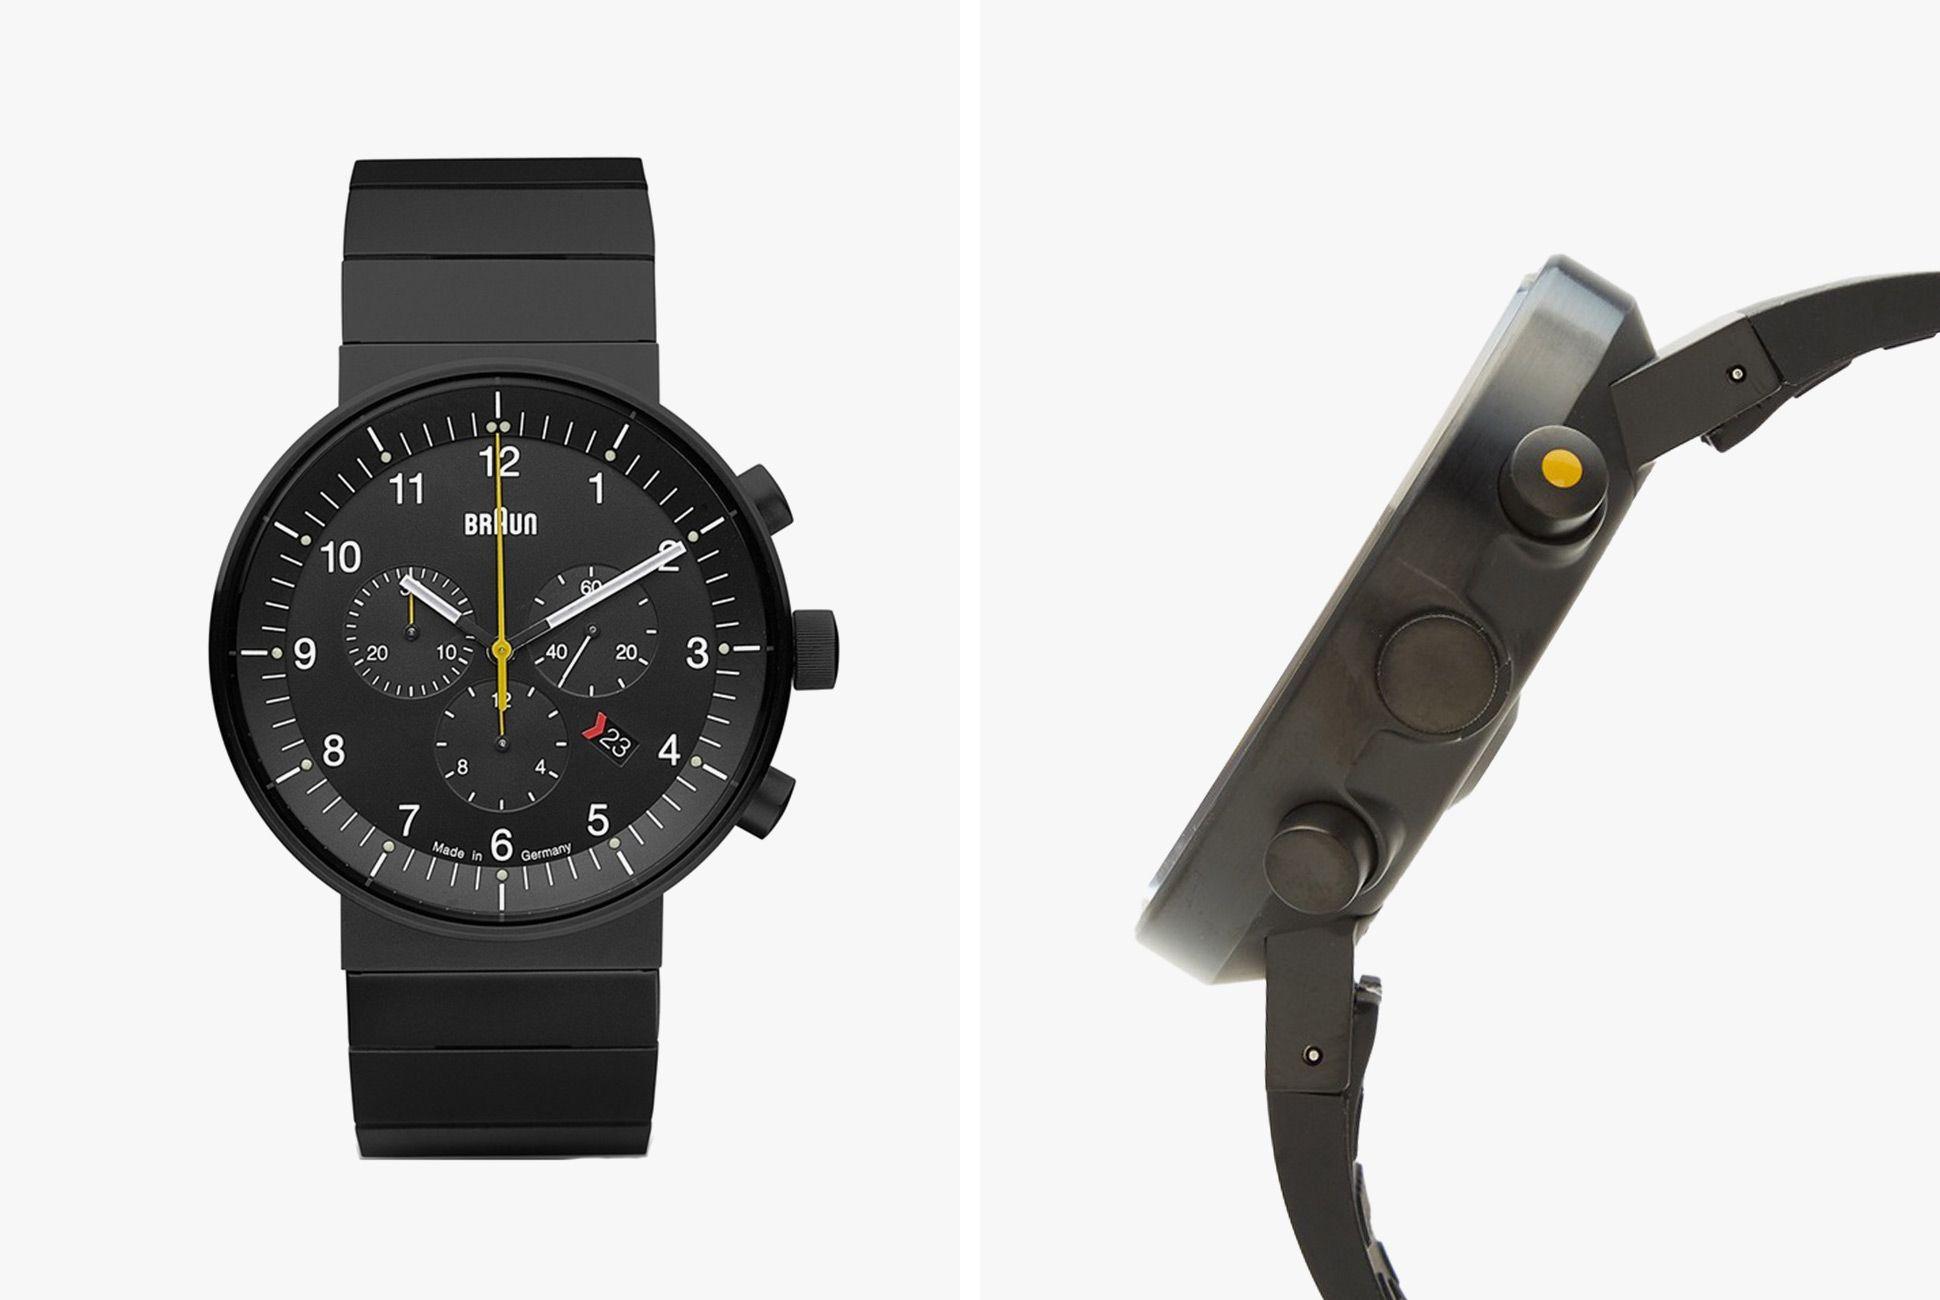 Braun-Simple-Watches-Gear-Patrol